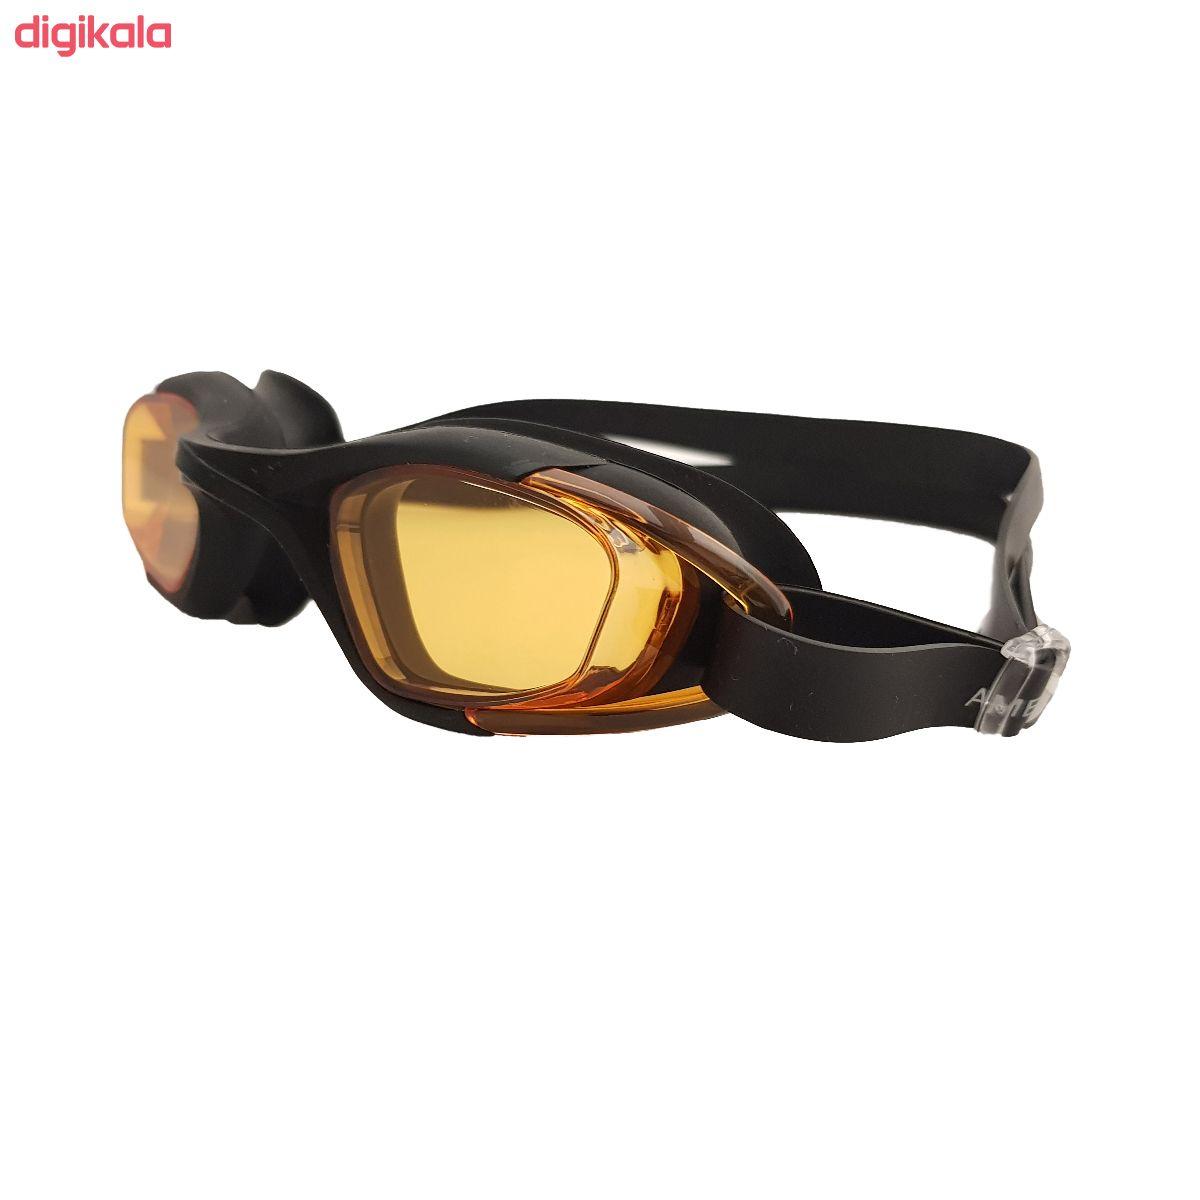 عینک شنا اکوا پرو مدل AMERAGE main 1 1